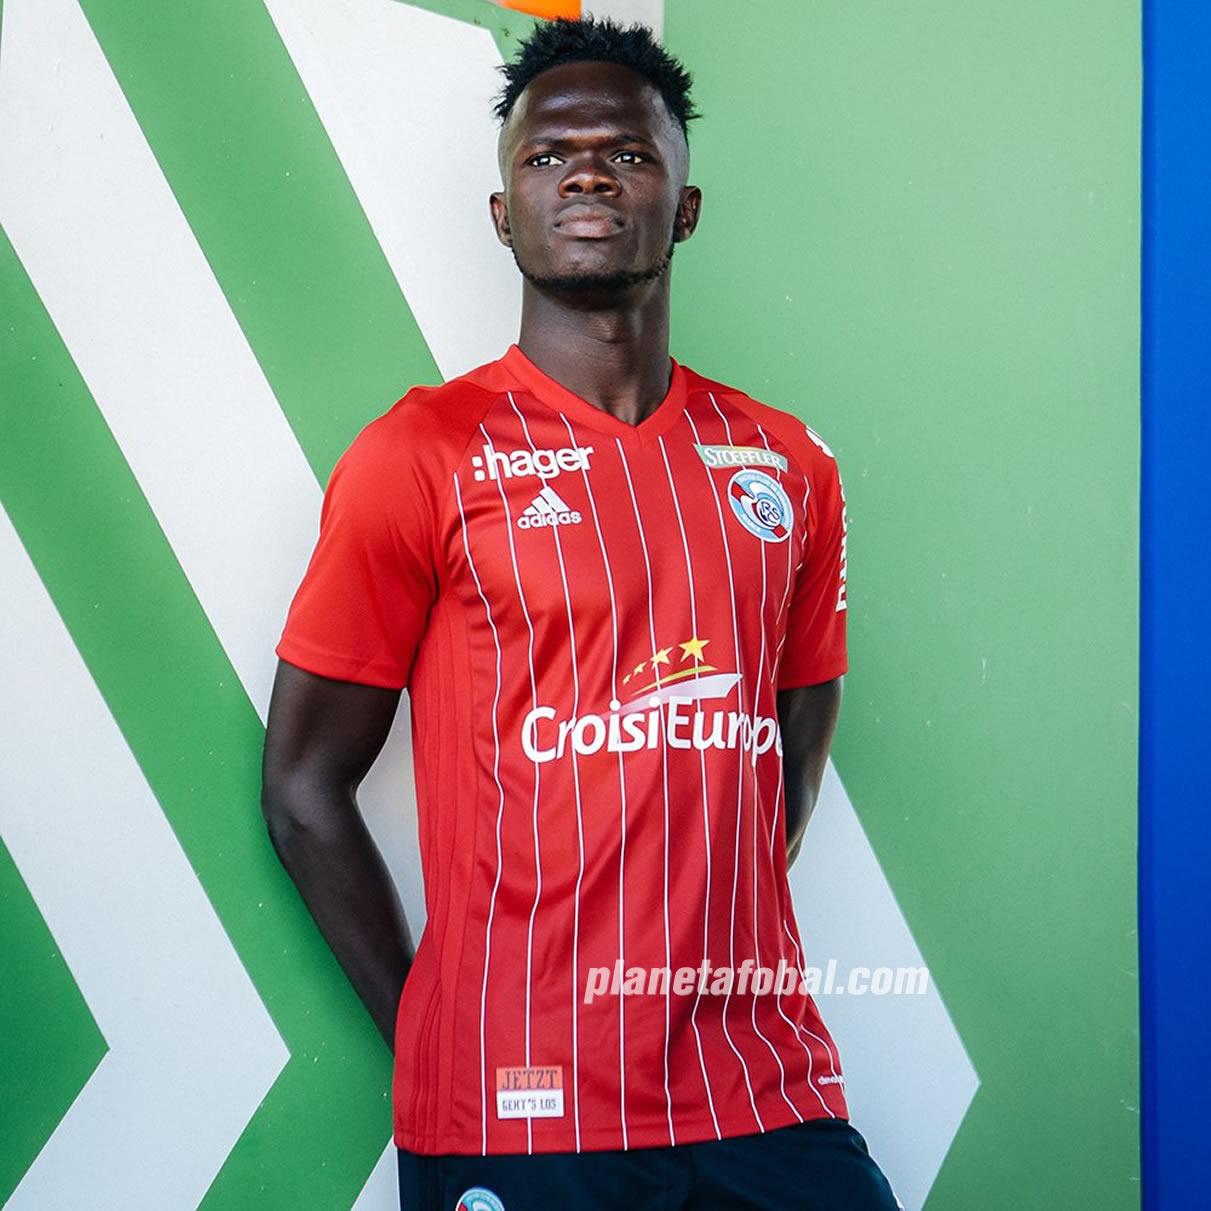 Tercerca camiseta Adidas del RC Strasbourg Alsace 2018/19 | Imagen Web Oficial